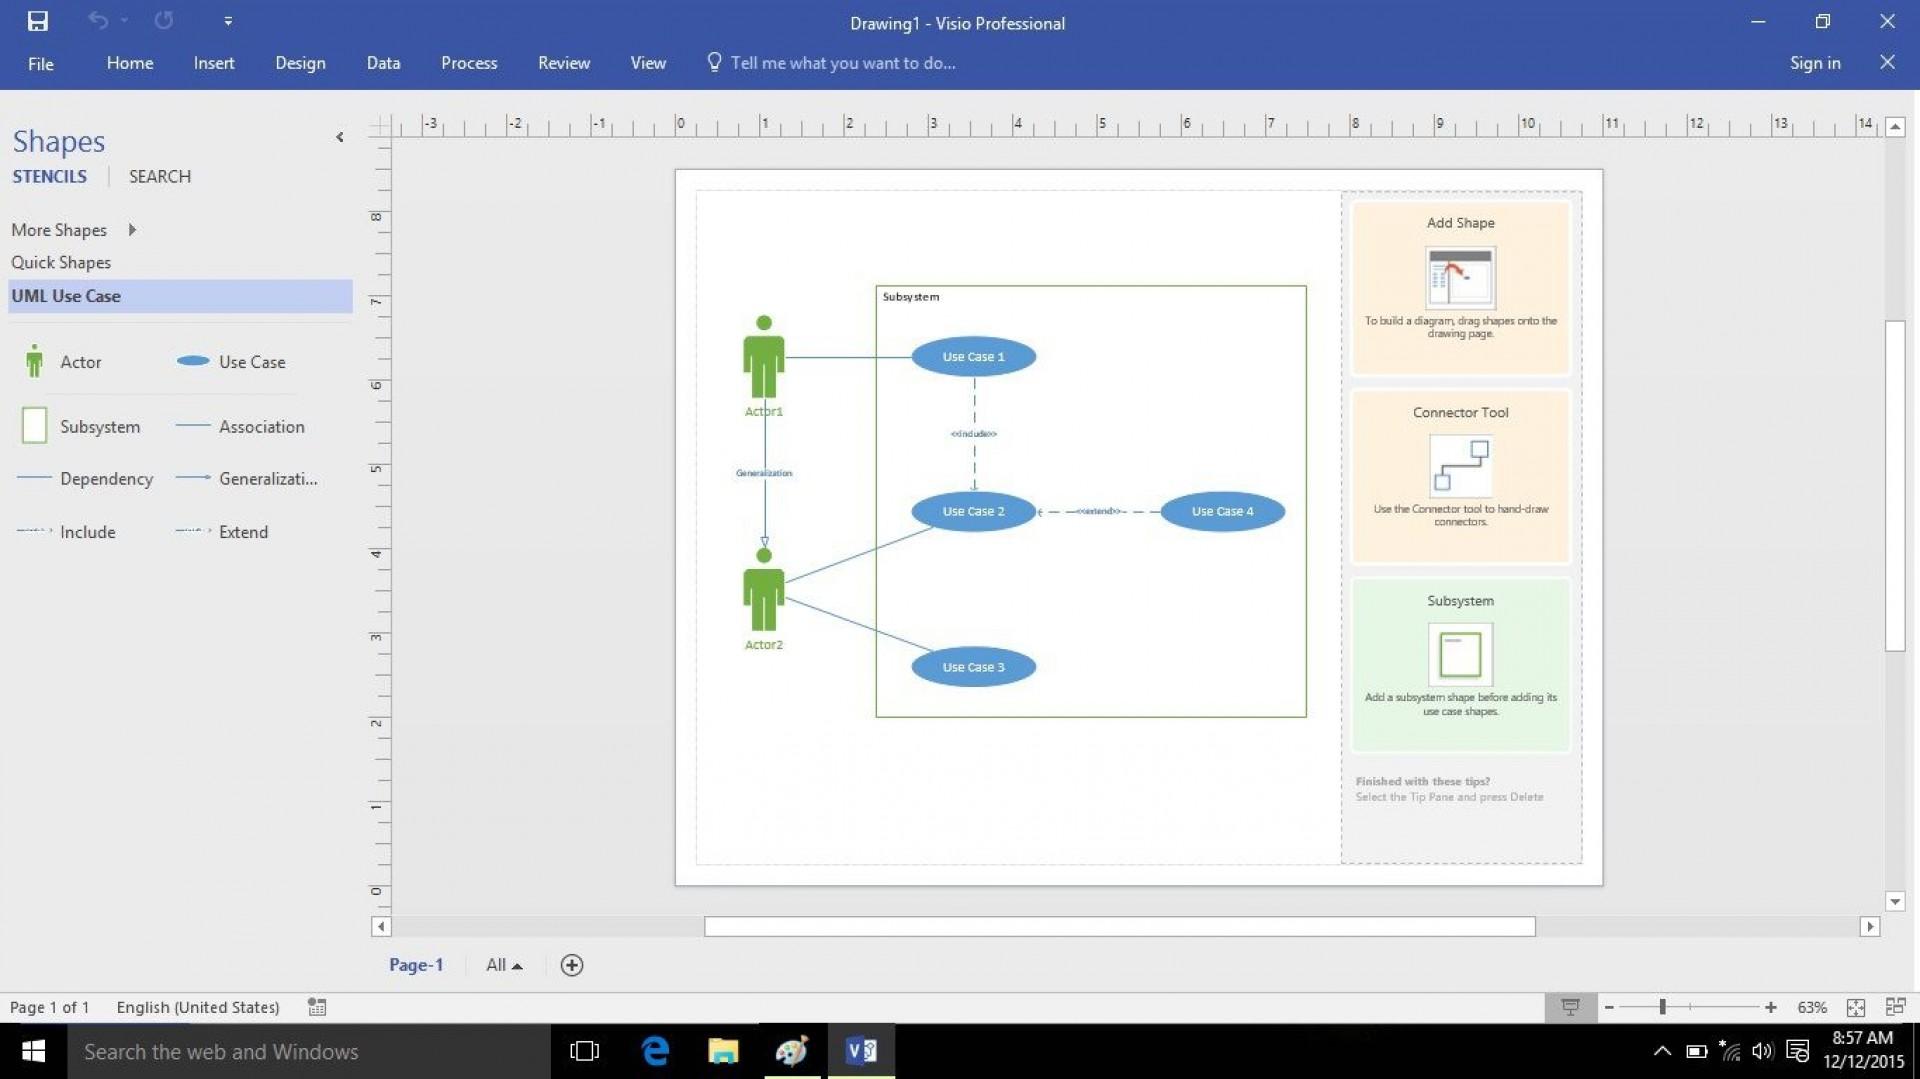 010 Singular Uml Diagram Template Visio 2010 Image  Model Download Clas1920